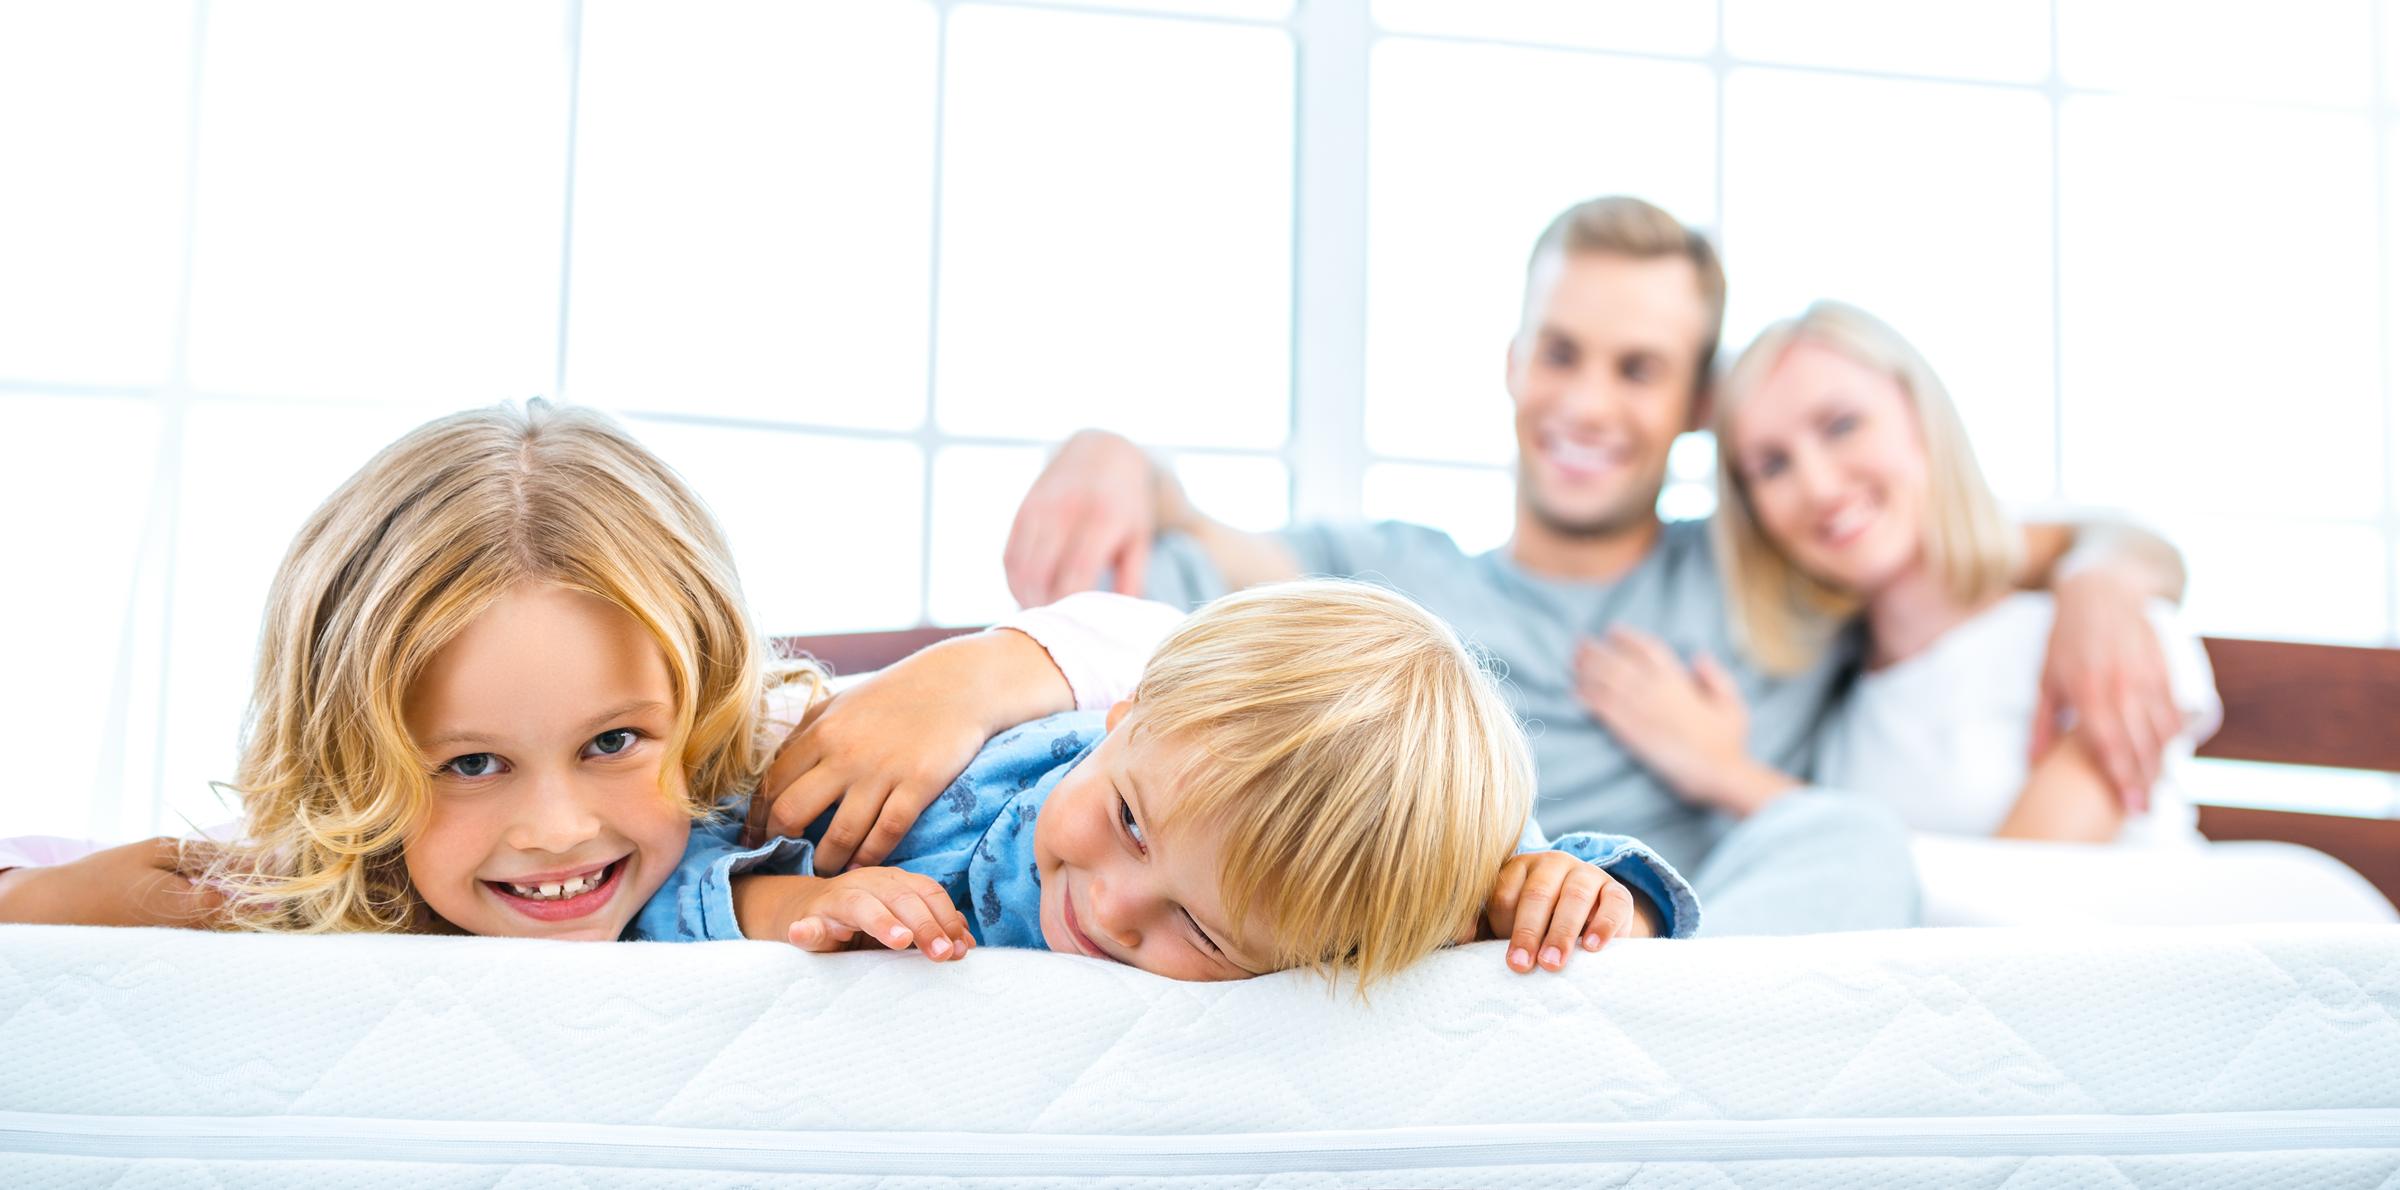 allergo encasings f r topper encasings f r boxspringbetten allergo natur. Black Bedroom Furniture Sets. Home Design Ideas